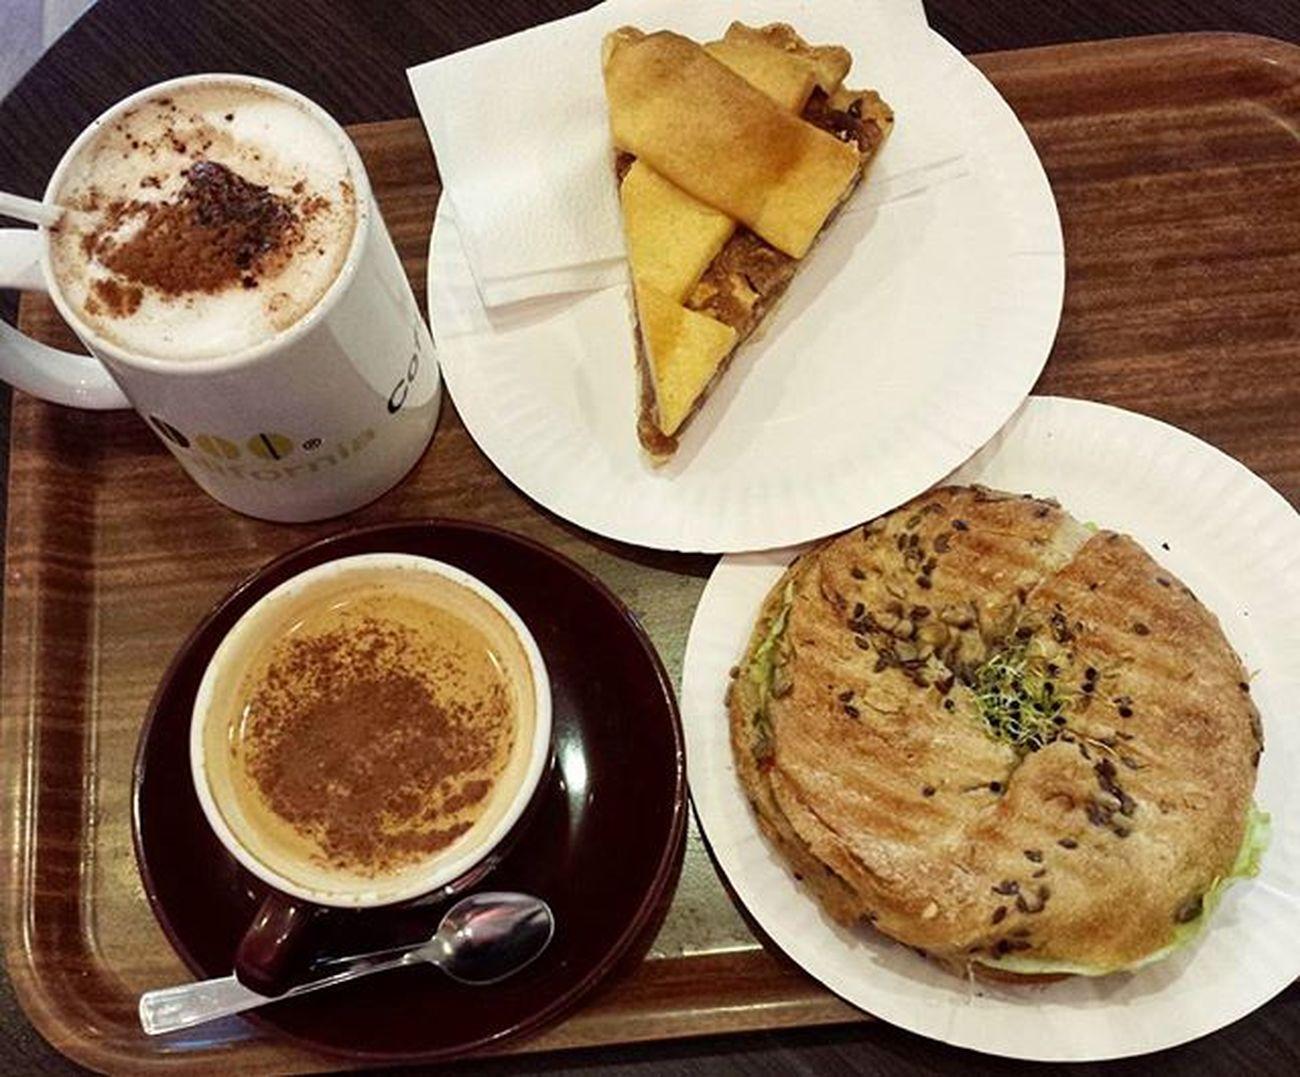 Az elso bagelem😋 @rolandkara ❤ Breakfast Bagel Wholewheat Coffee Applepie Yummy Fitfood Healthyfood Eating Foodstagram Mutimiteszel_fitt Likeforlike Followme Followforfollow Mutimiteszel Breakie Healthychoices Food Foodpic CaliforniaCoffee